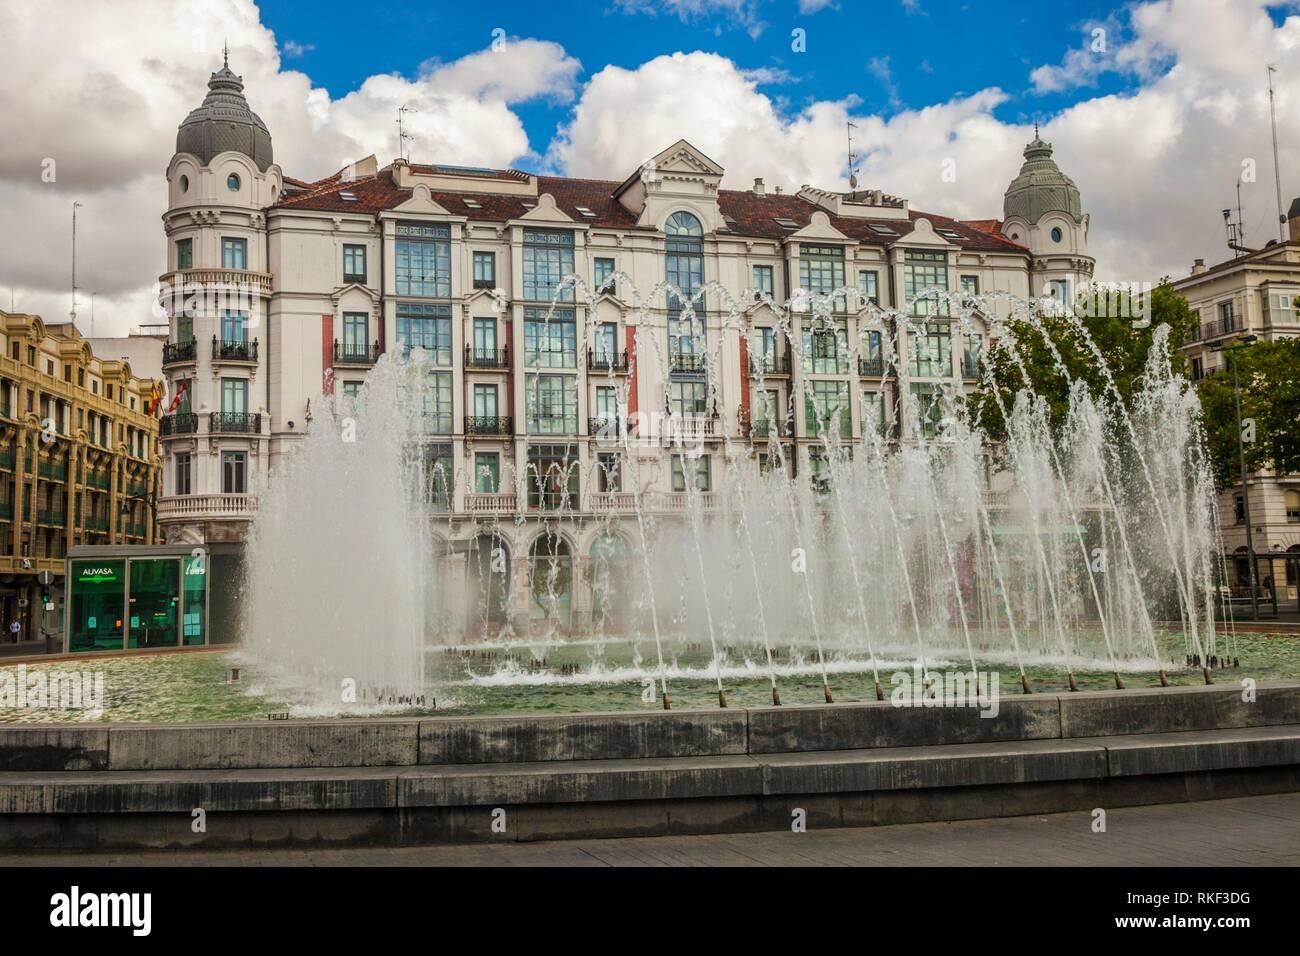 Zorrilla Square, Valladolid, Castilla y Leon, Spain - Stock Image